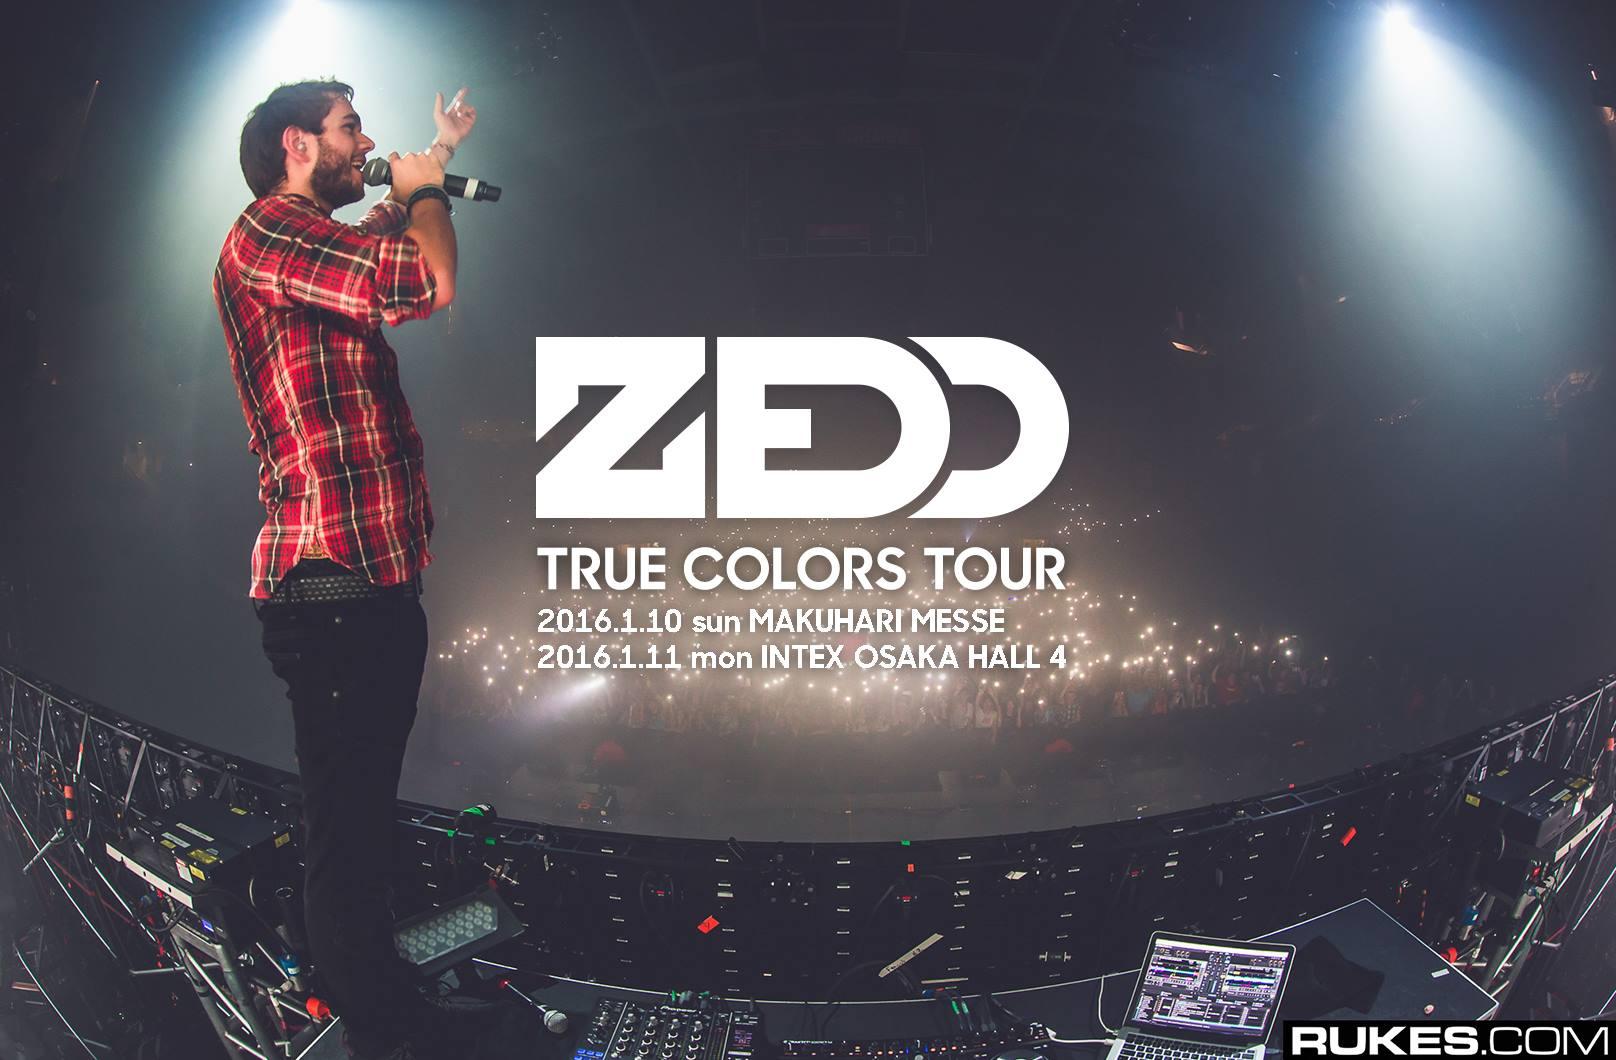 ZEDD 2016 1